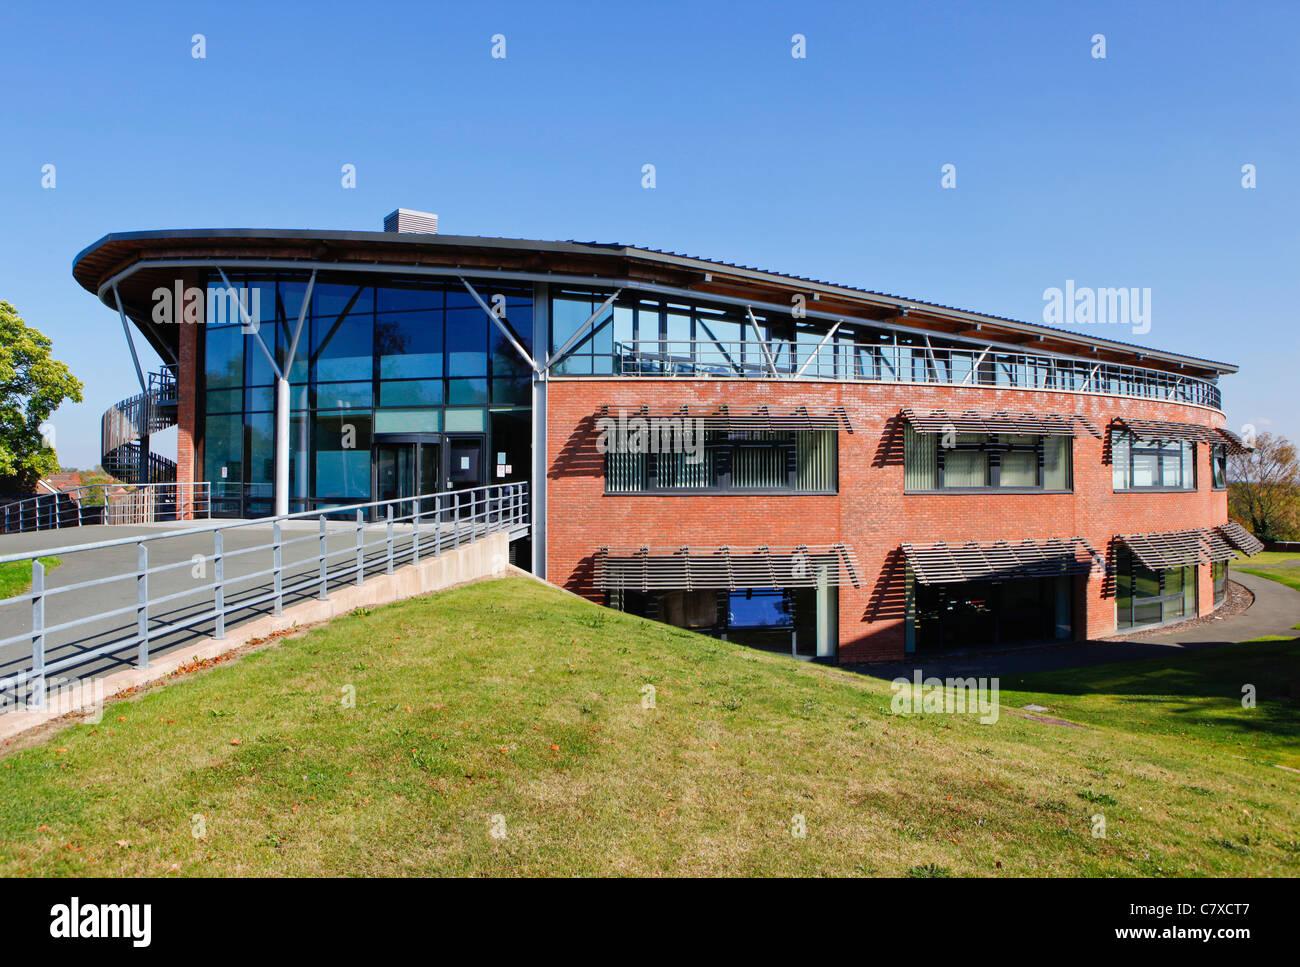 E-innovation centre de l'Université de Wolverhampton, Telford, Shropshire Campus. Photo Stock